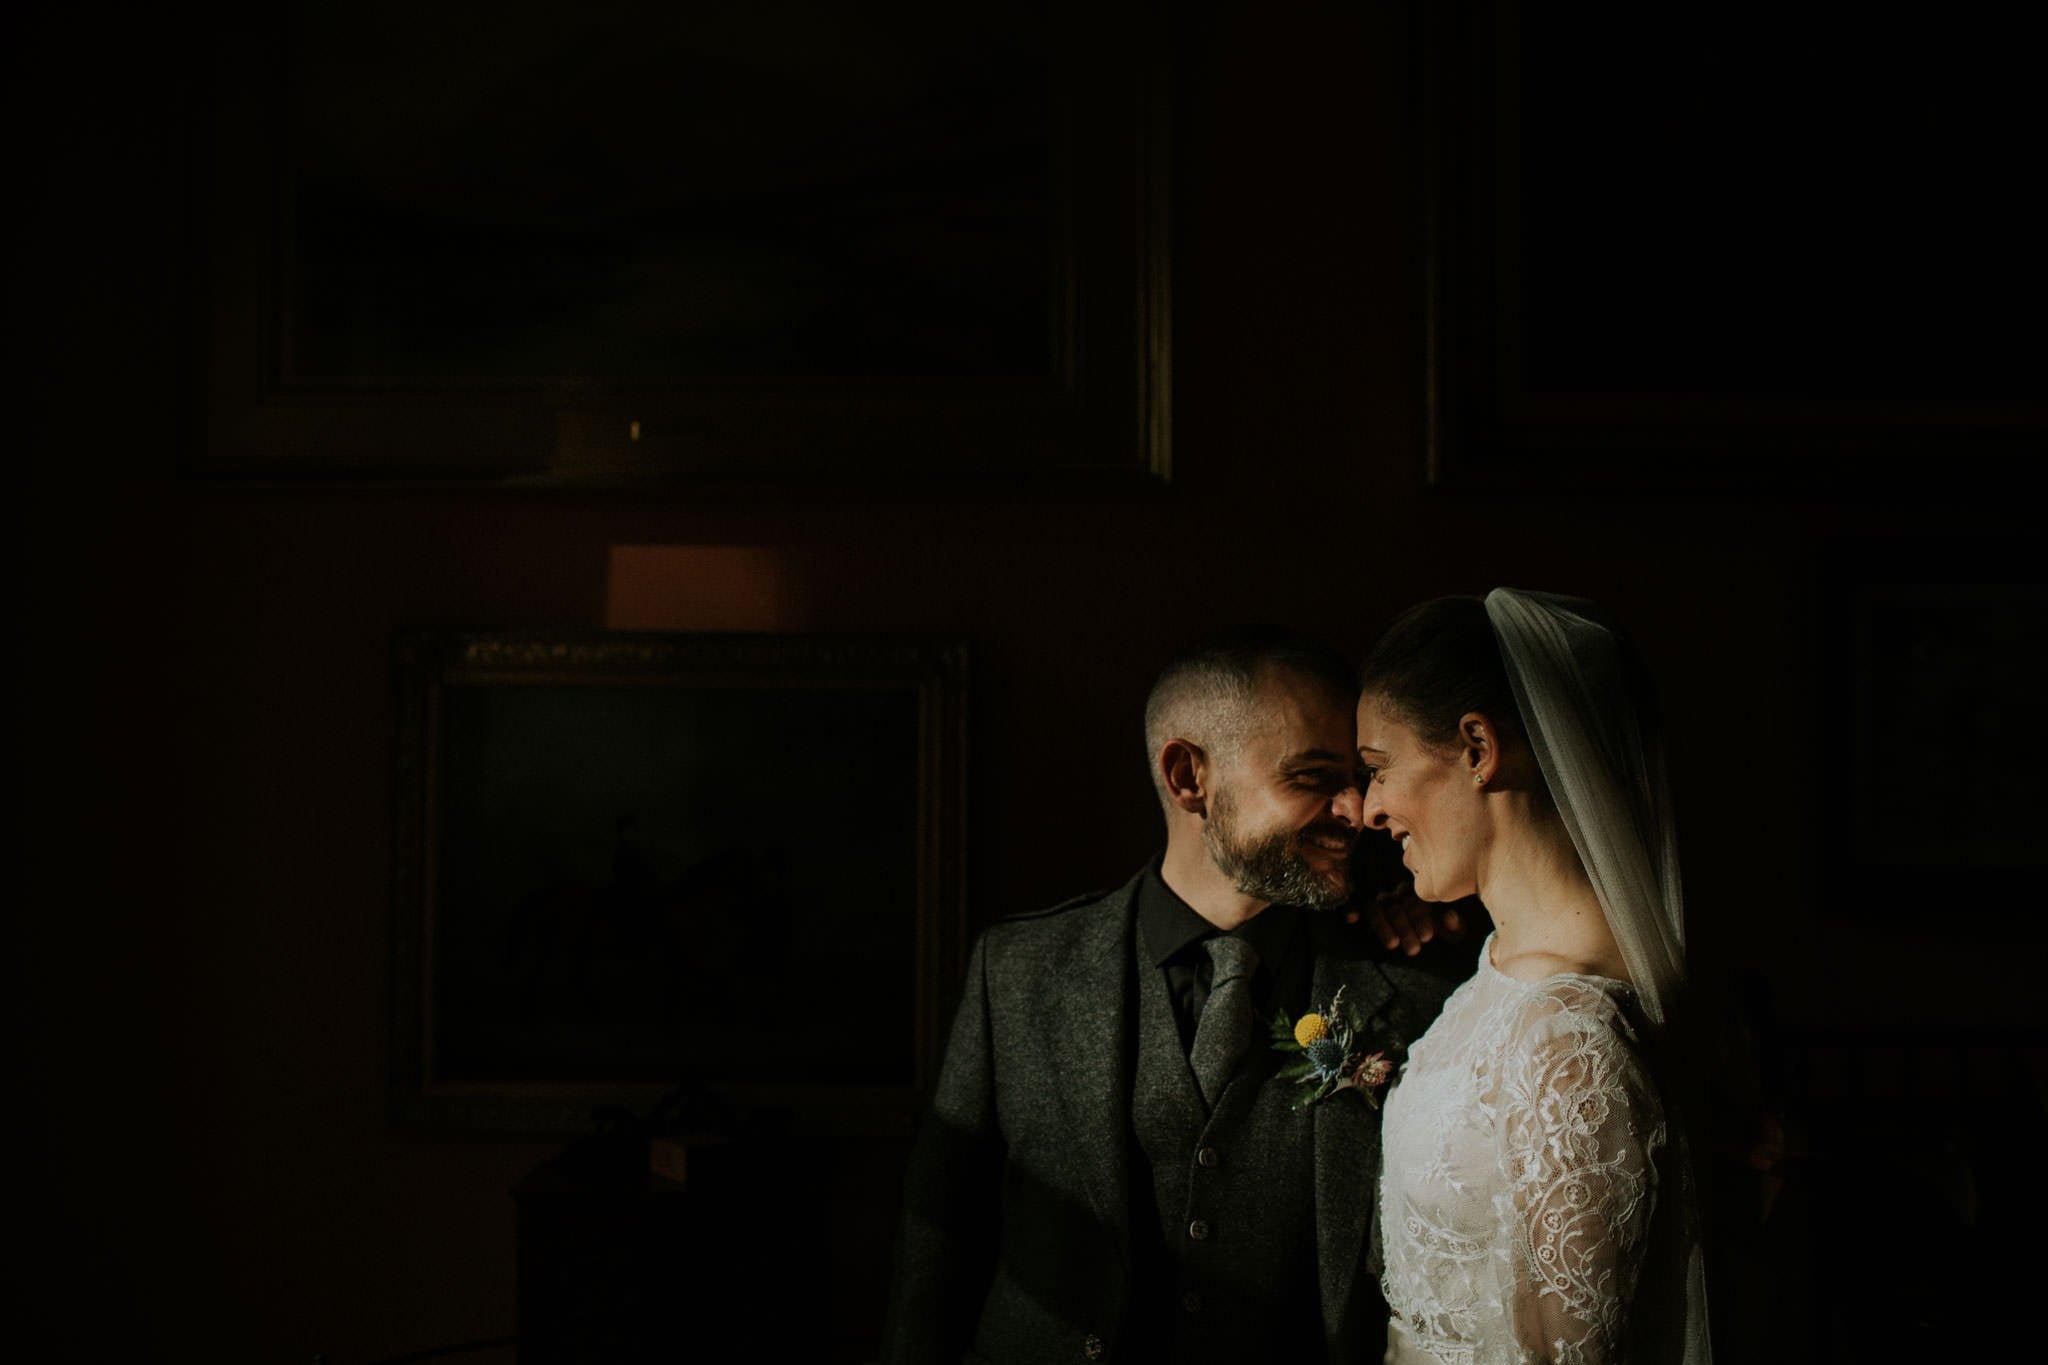 fine-art-wedding-photography-scotland 073